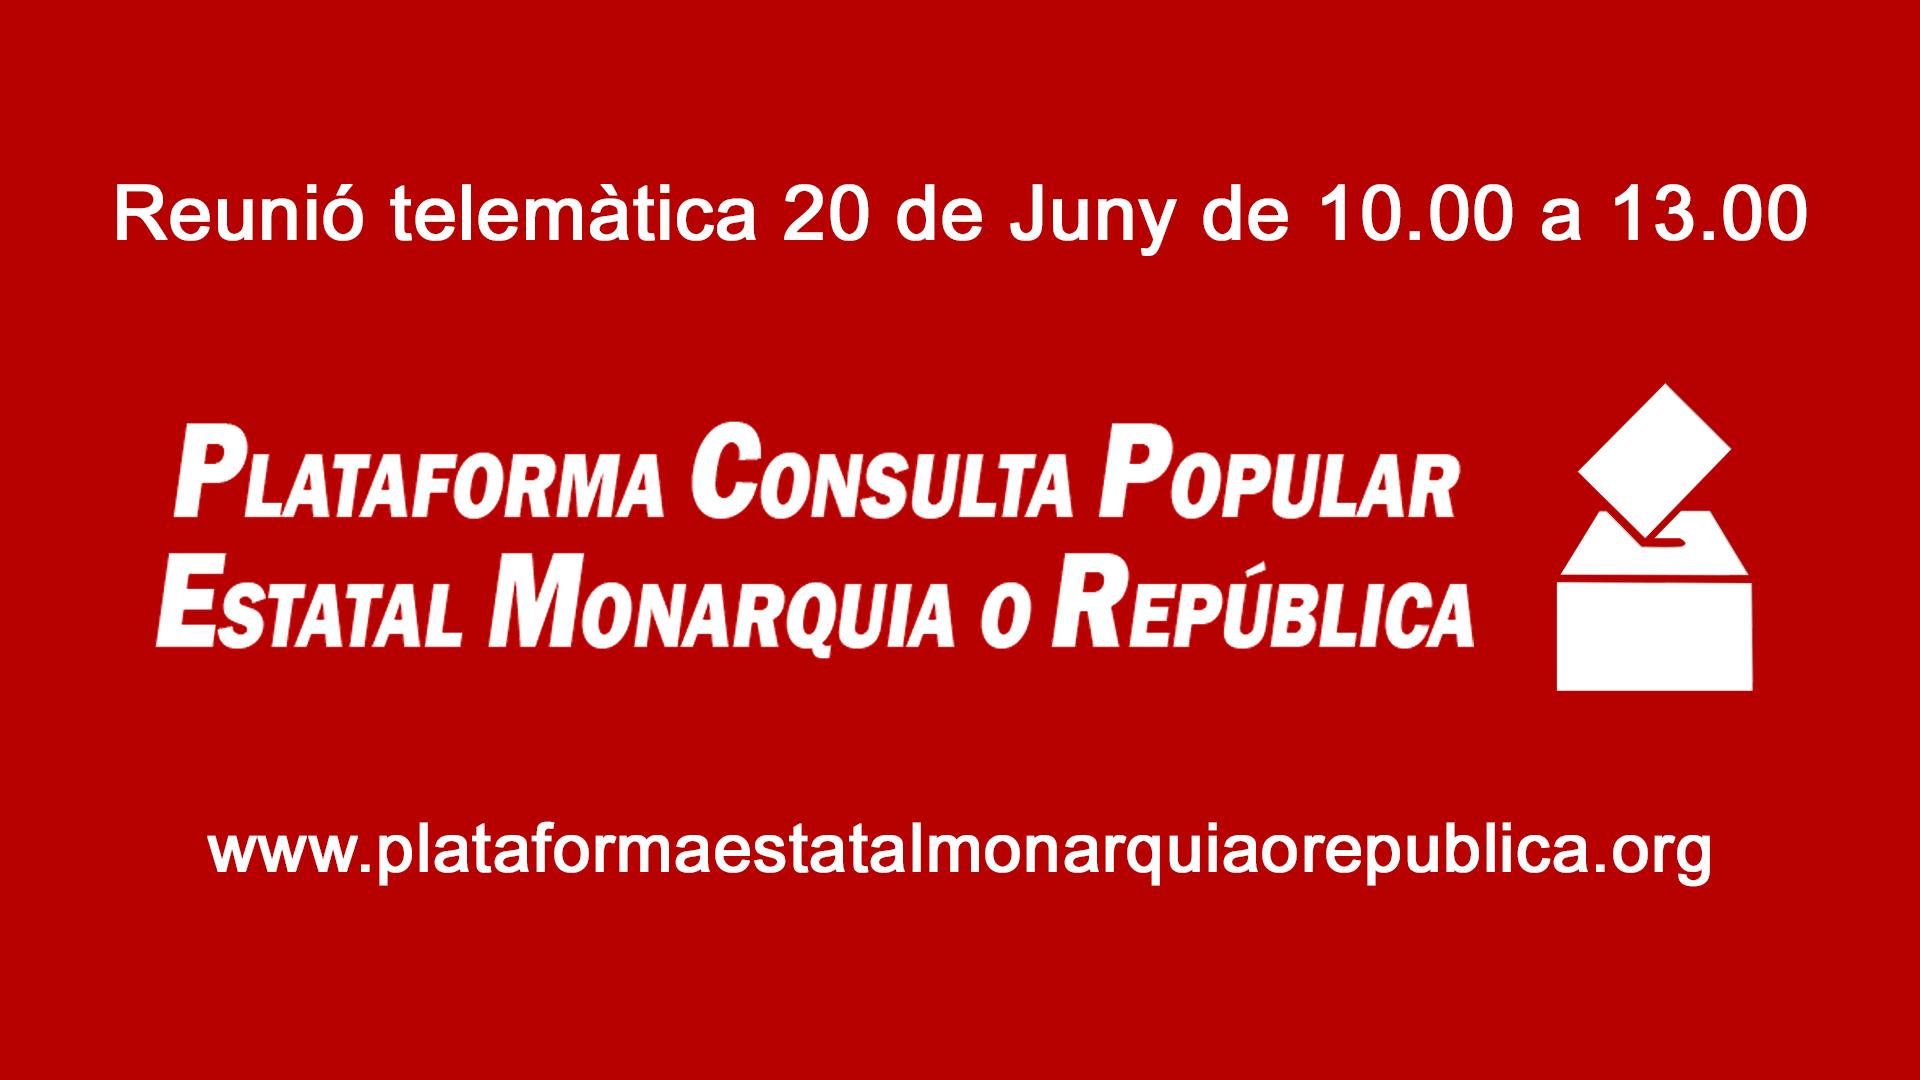 "<span class=""dojodigital_toggle_title"">Convocatòria de reunió telemática 20 de juny de 2020</span>"